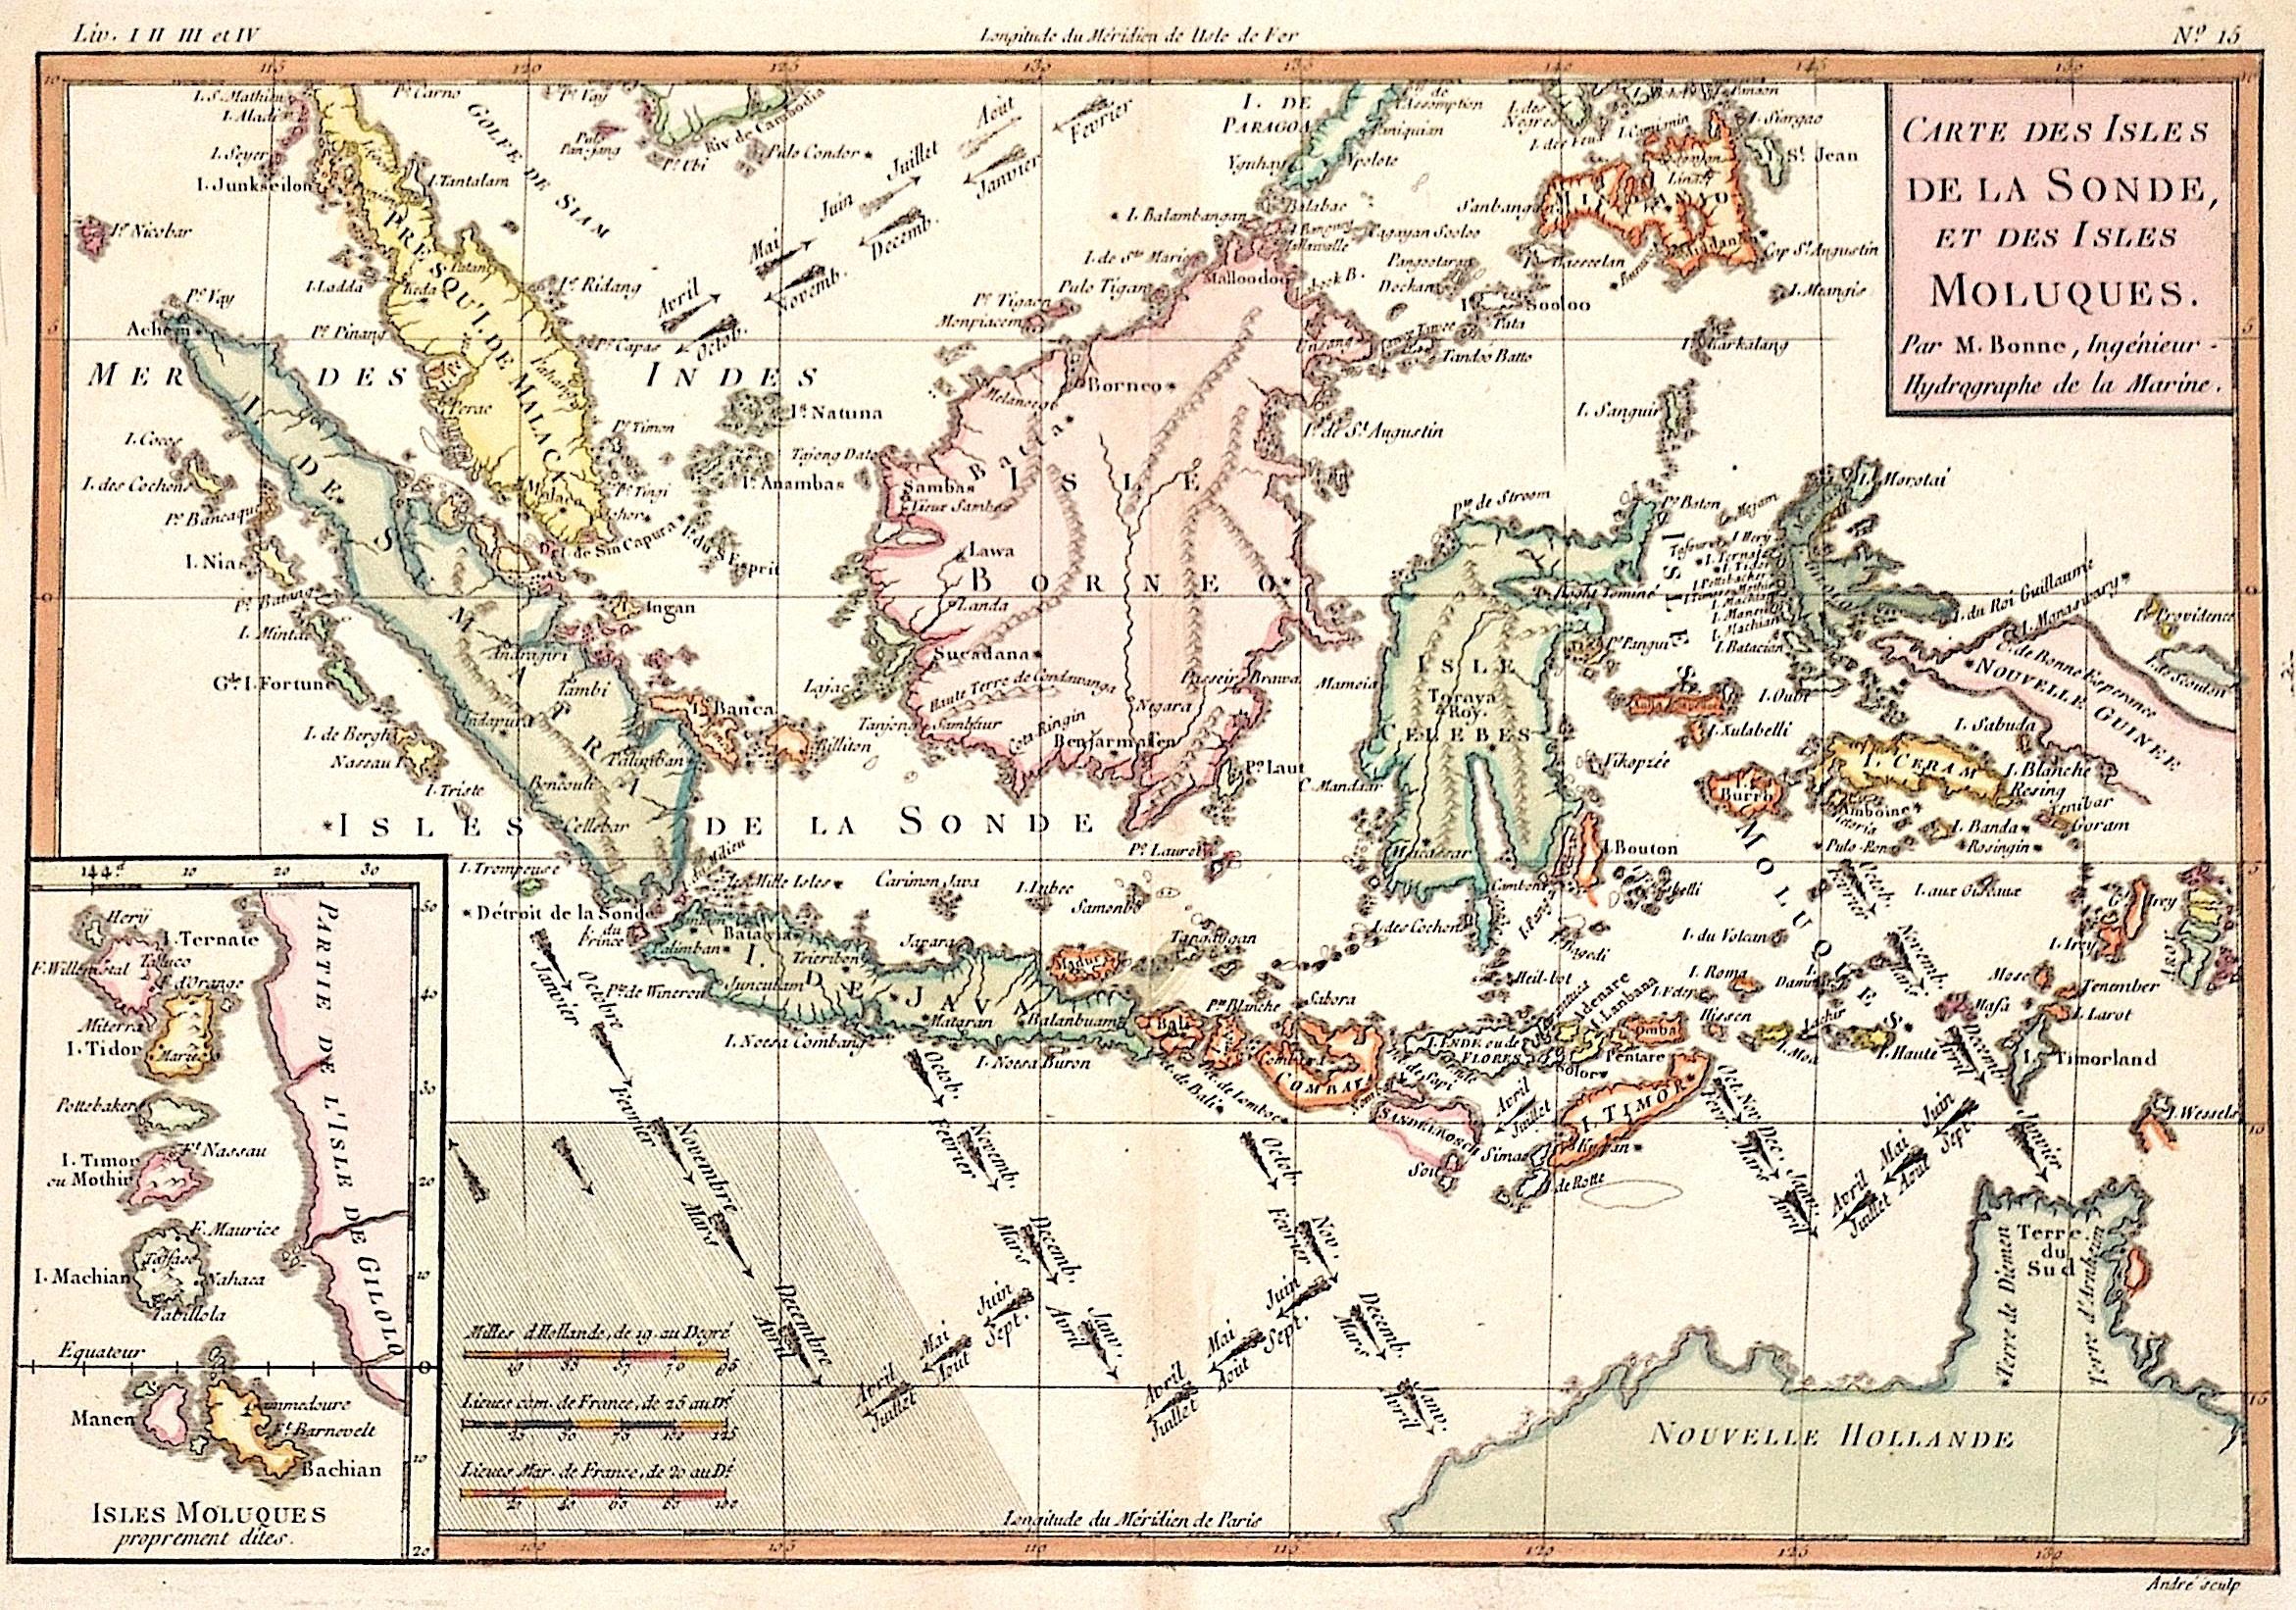 Bonne Rigobert Carte des Isles de la Sonde, et des Isles Moluques.